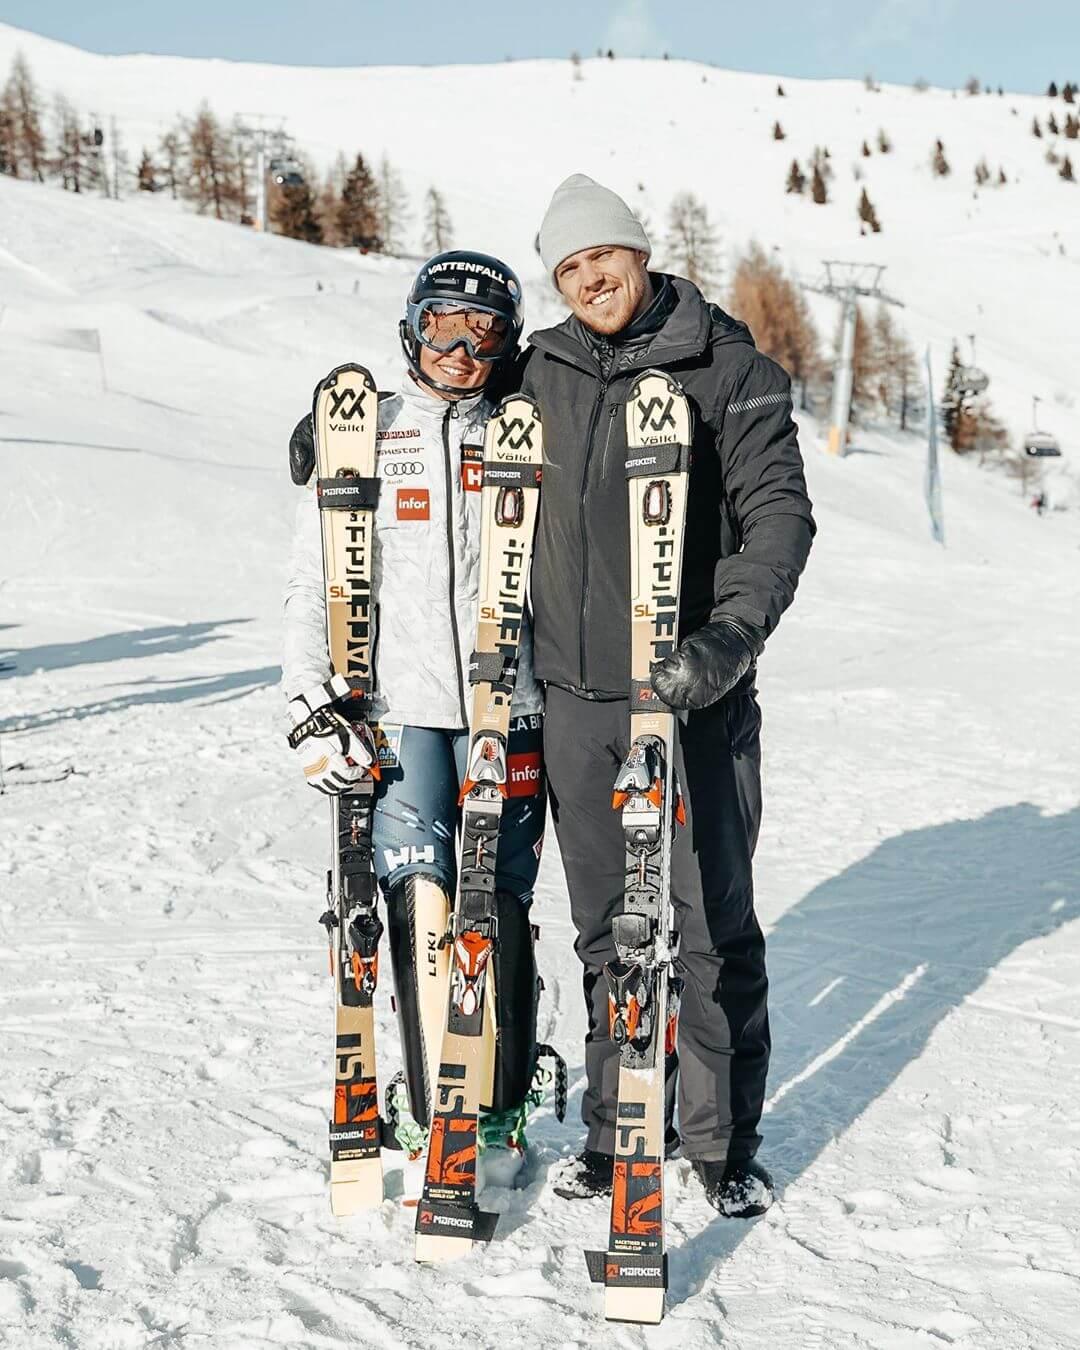 27-летняя Илва Сталнаке завершает карьеру